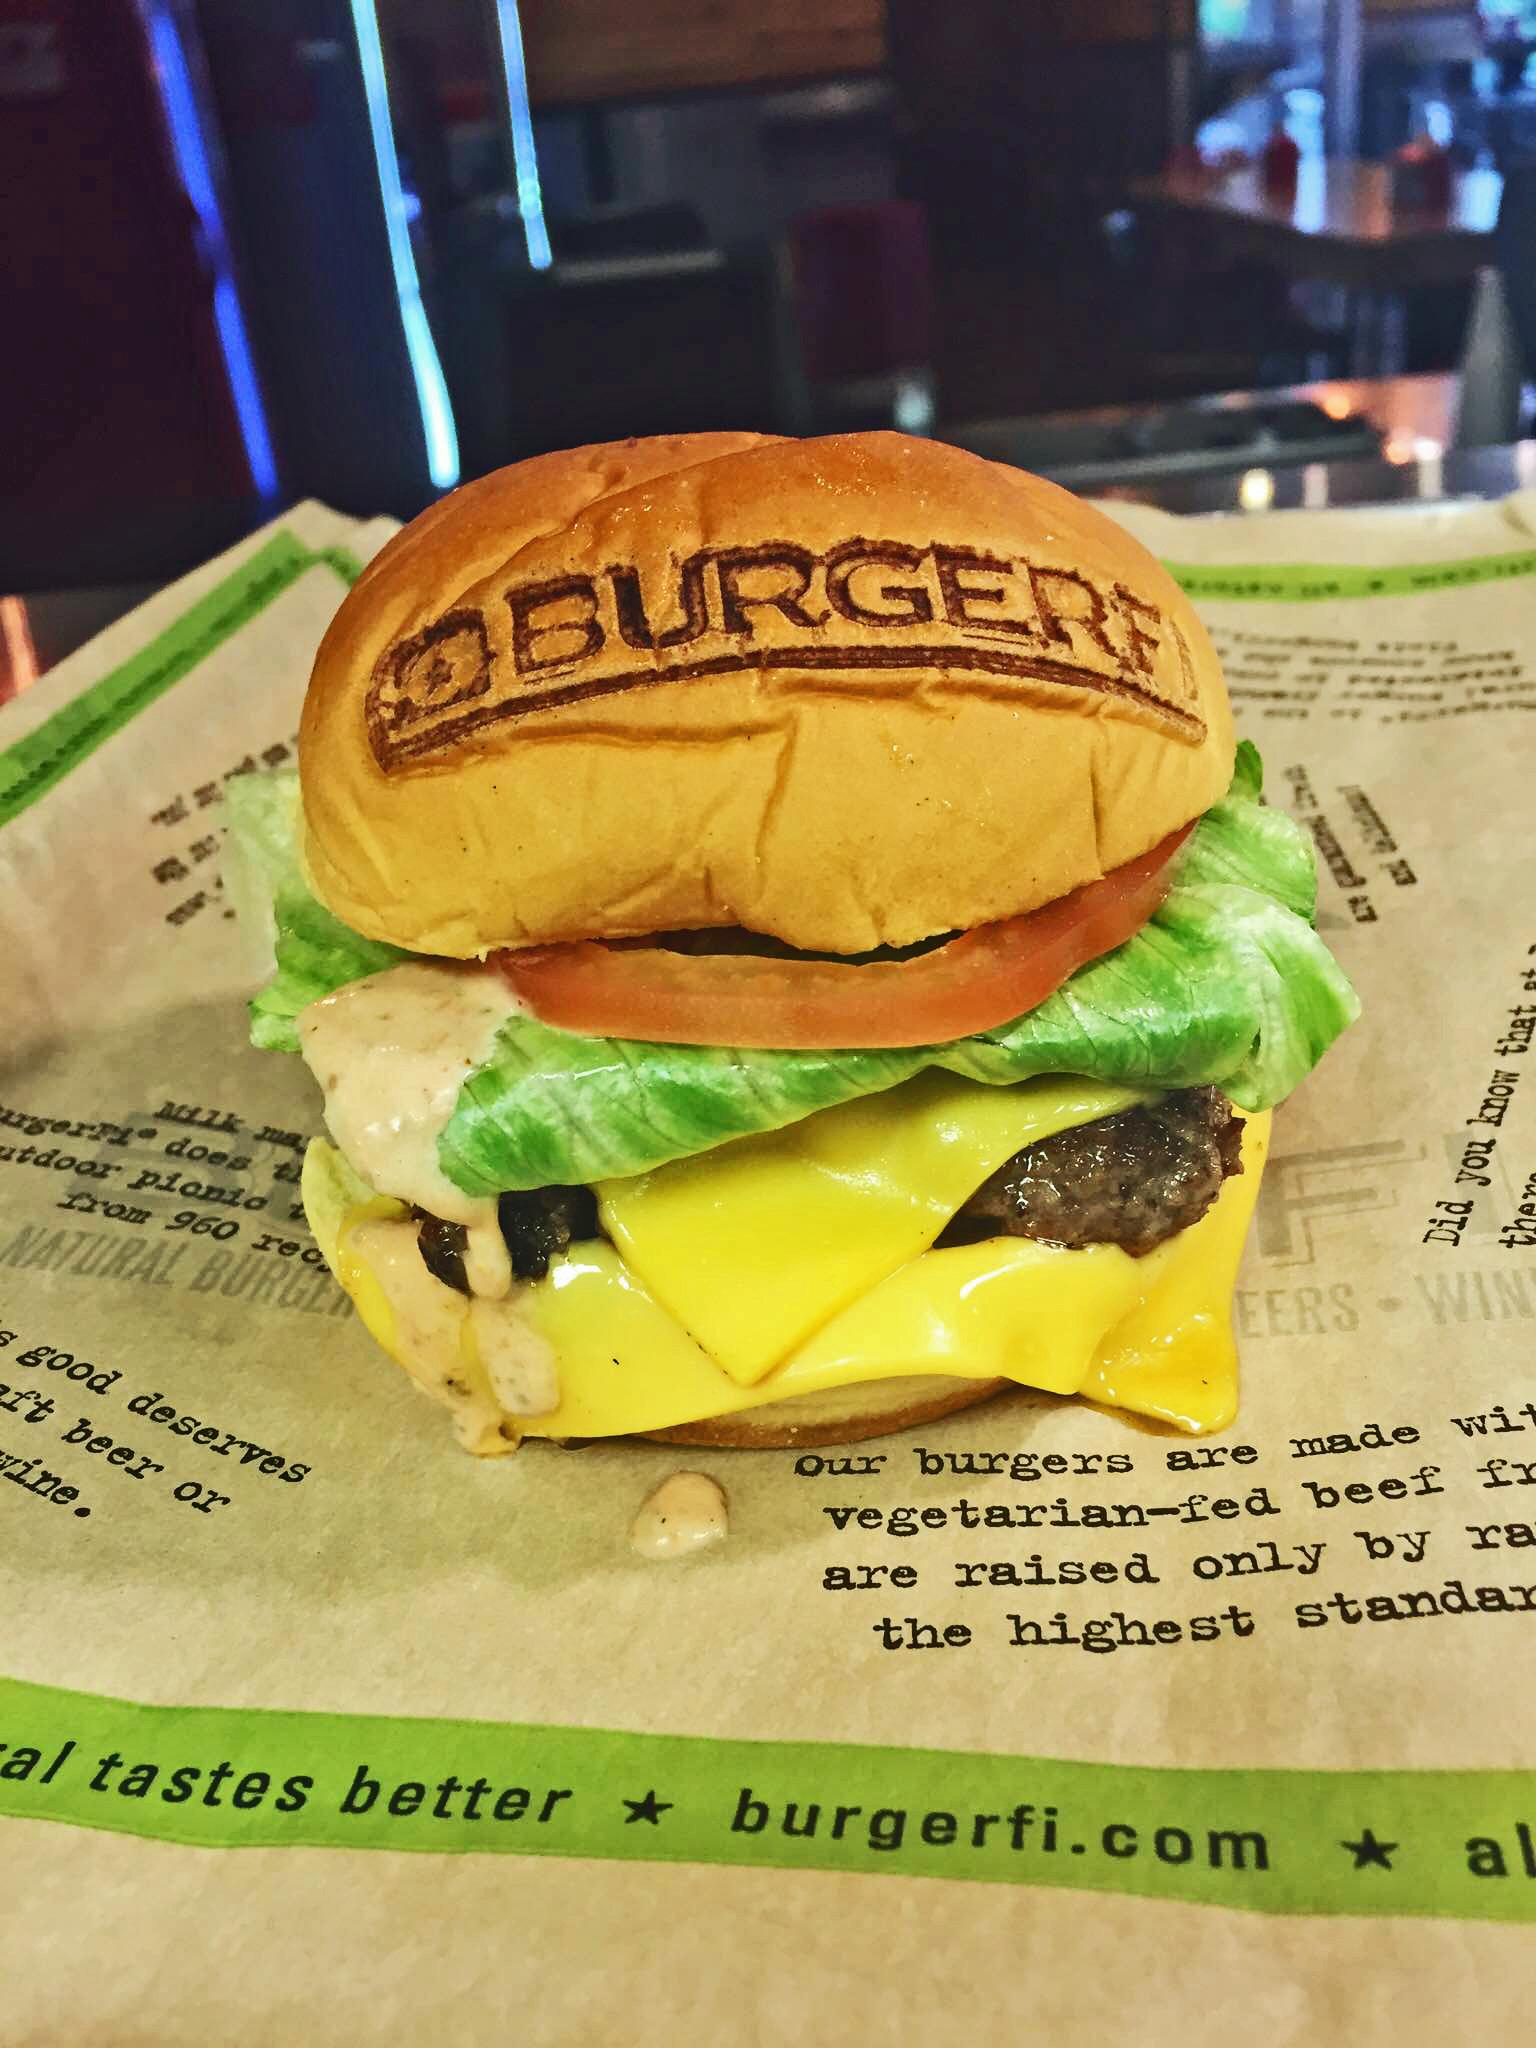 image: burgerfi